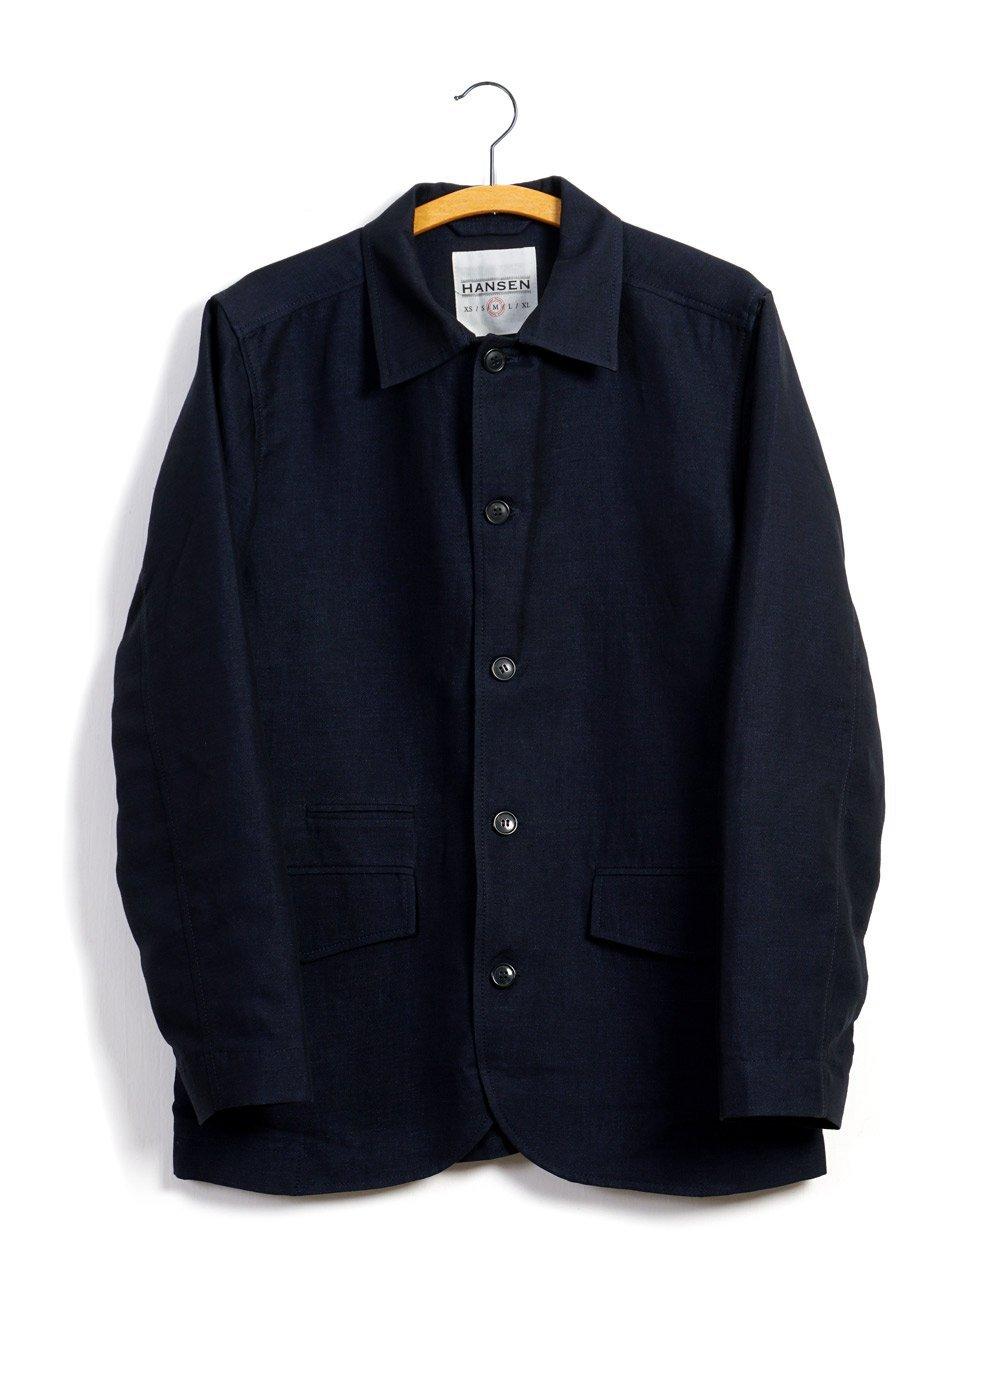 Hansen Garments JOHANNES | Casual Blazer Jacket | 3-tone-blue